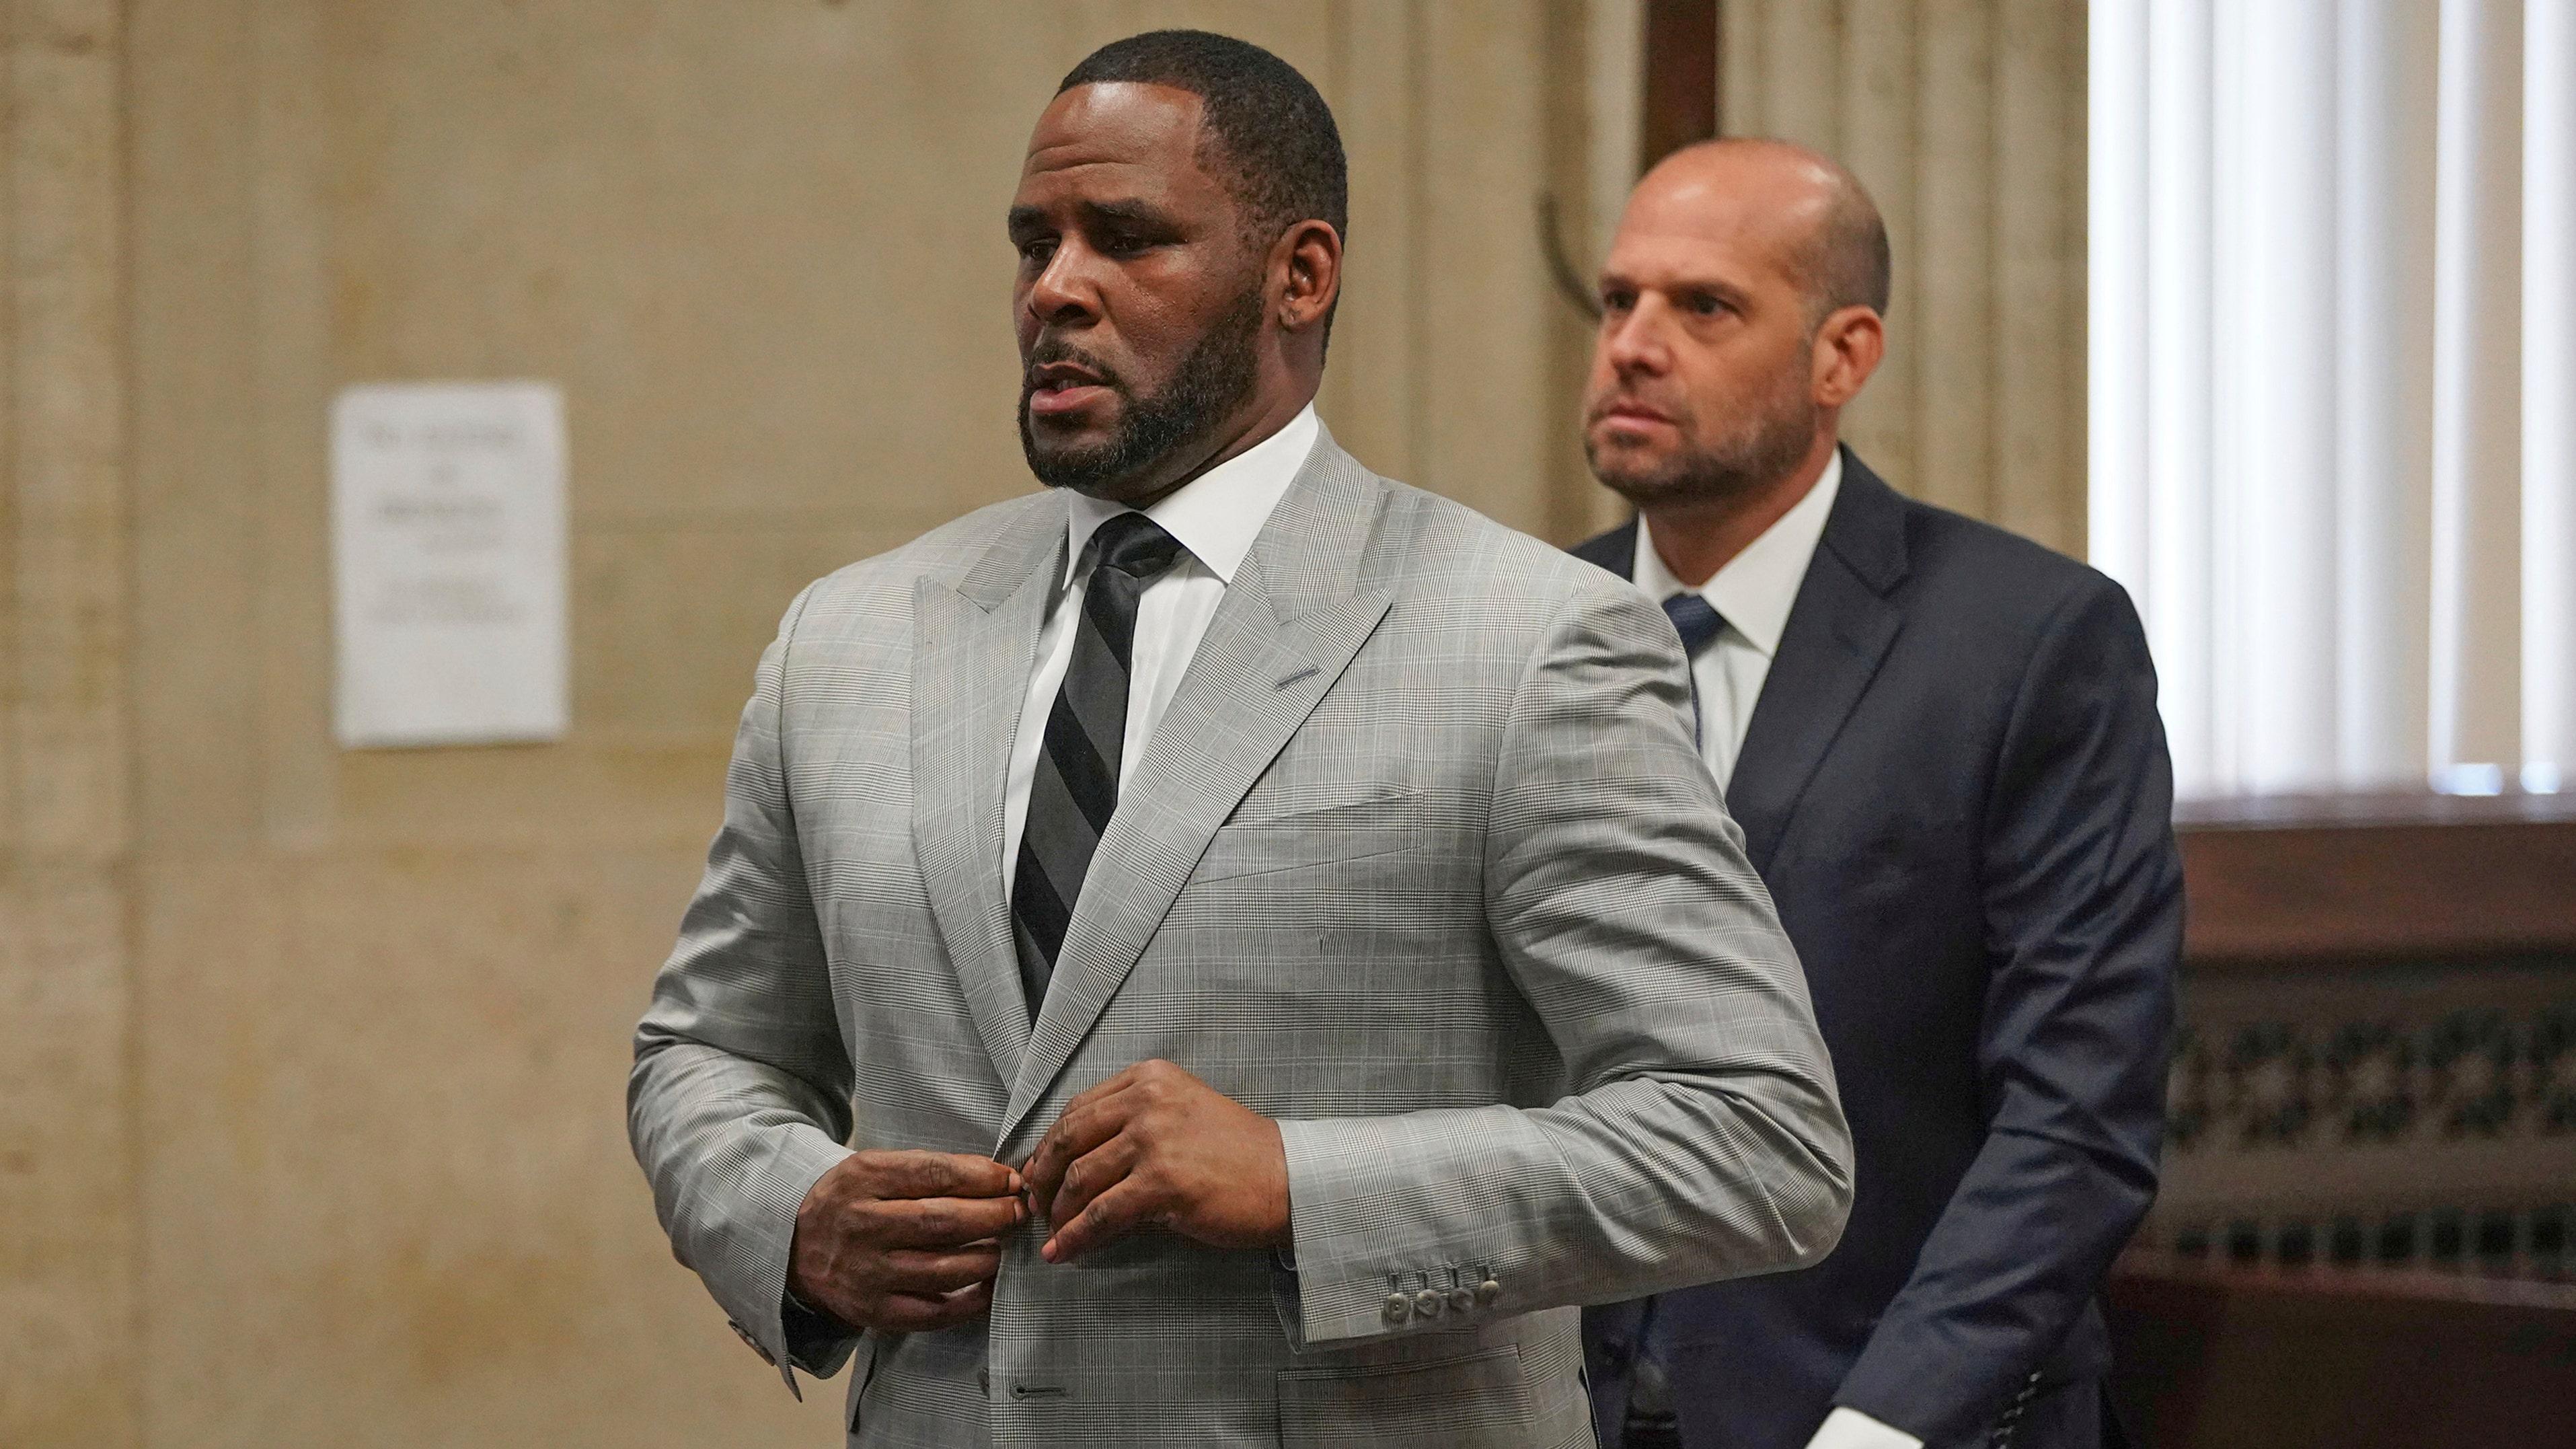 R. Kelly επιδιώκει την απελευθέρωση από τη φυλακή πάνω από coronavirus ανησυχίες